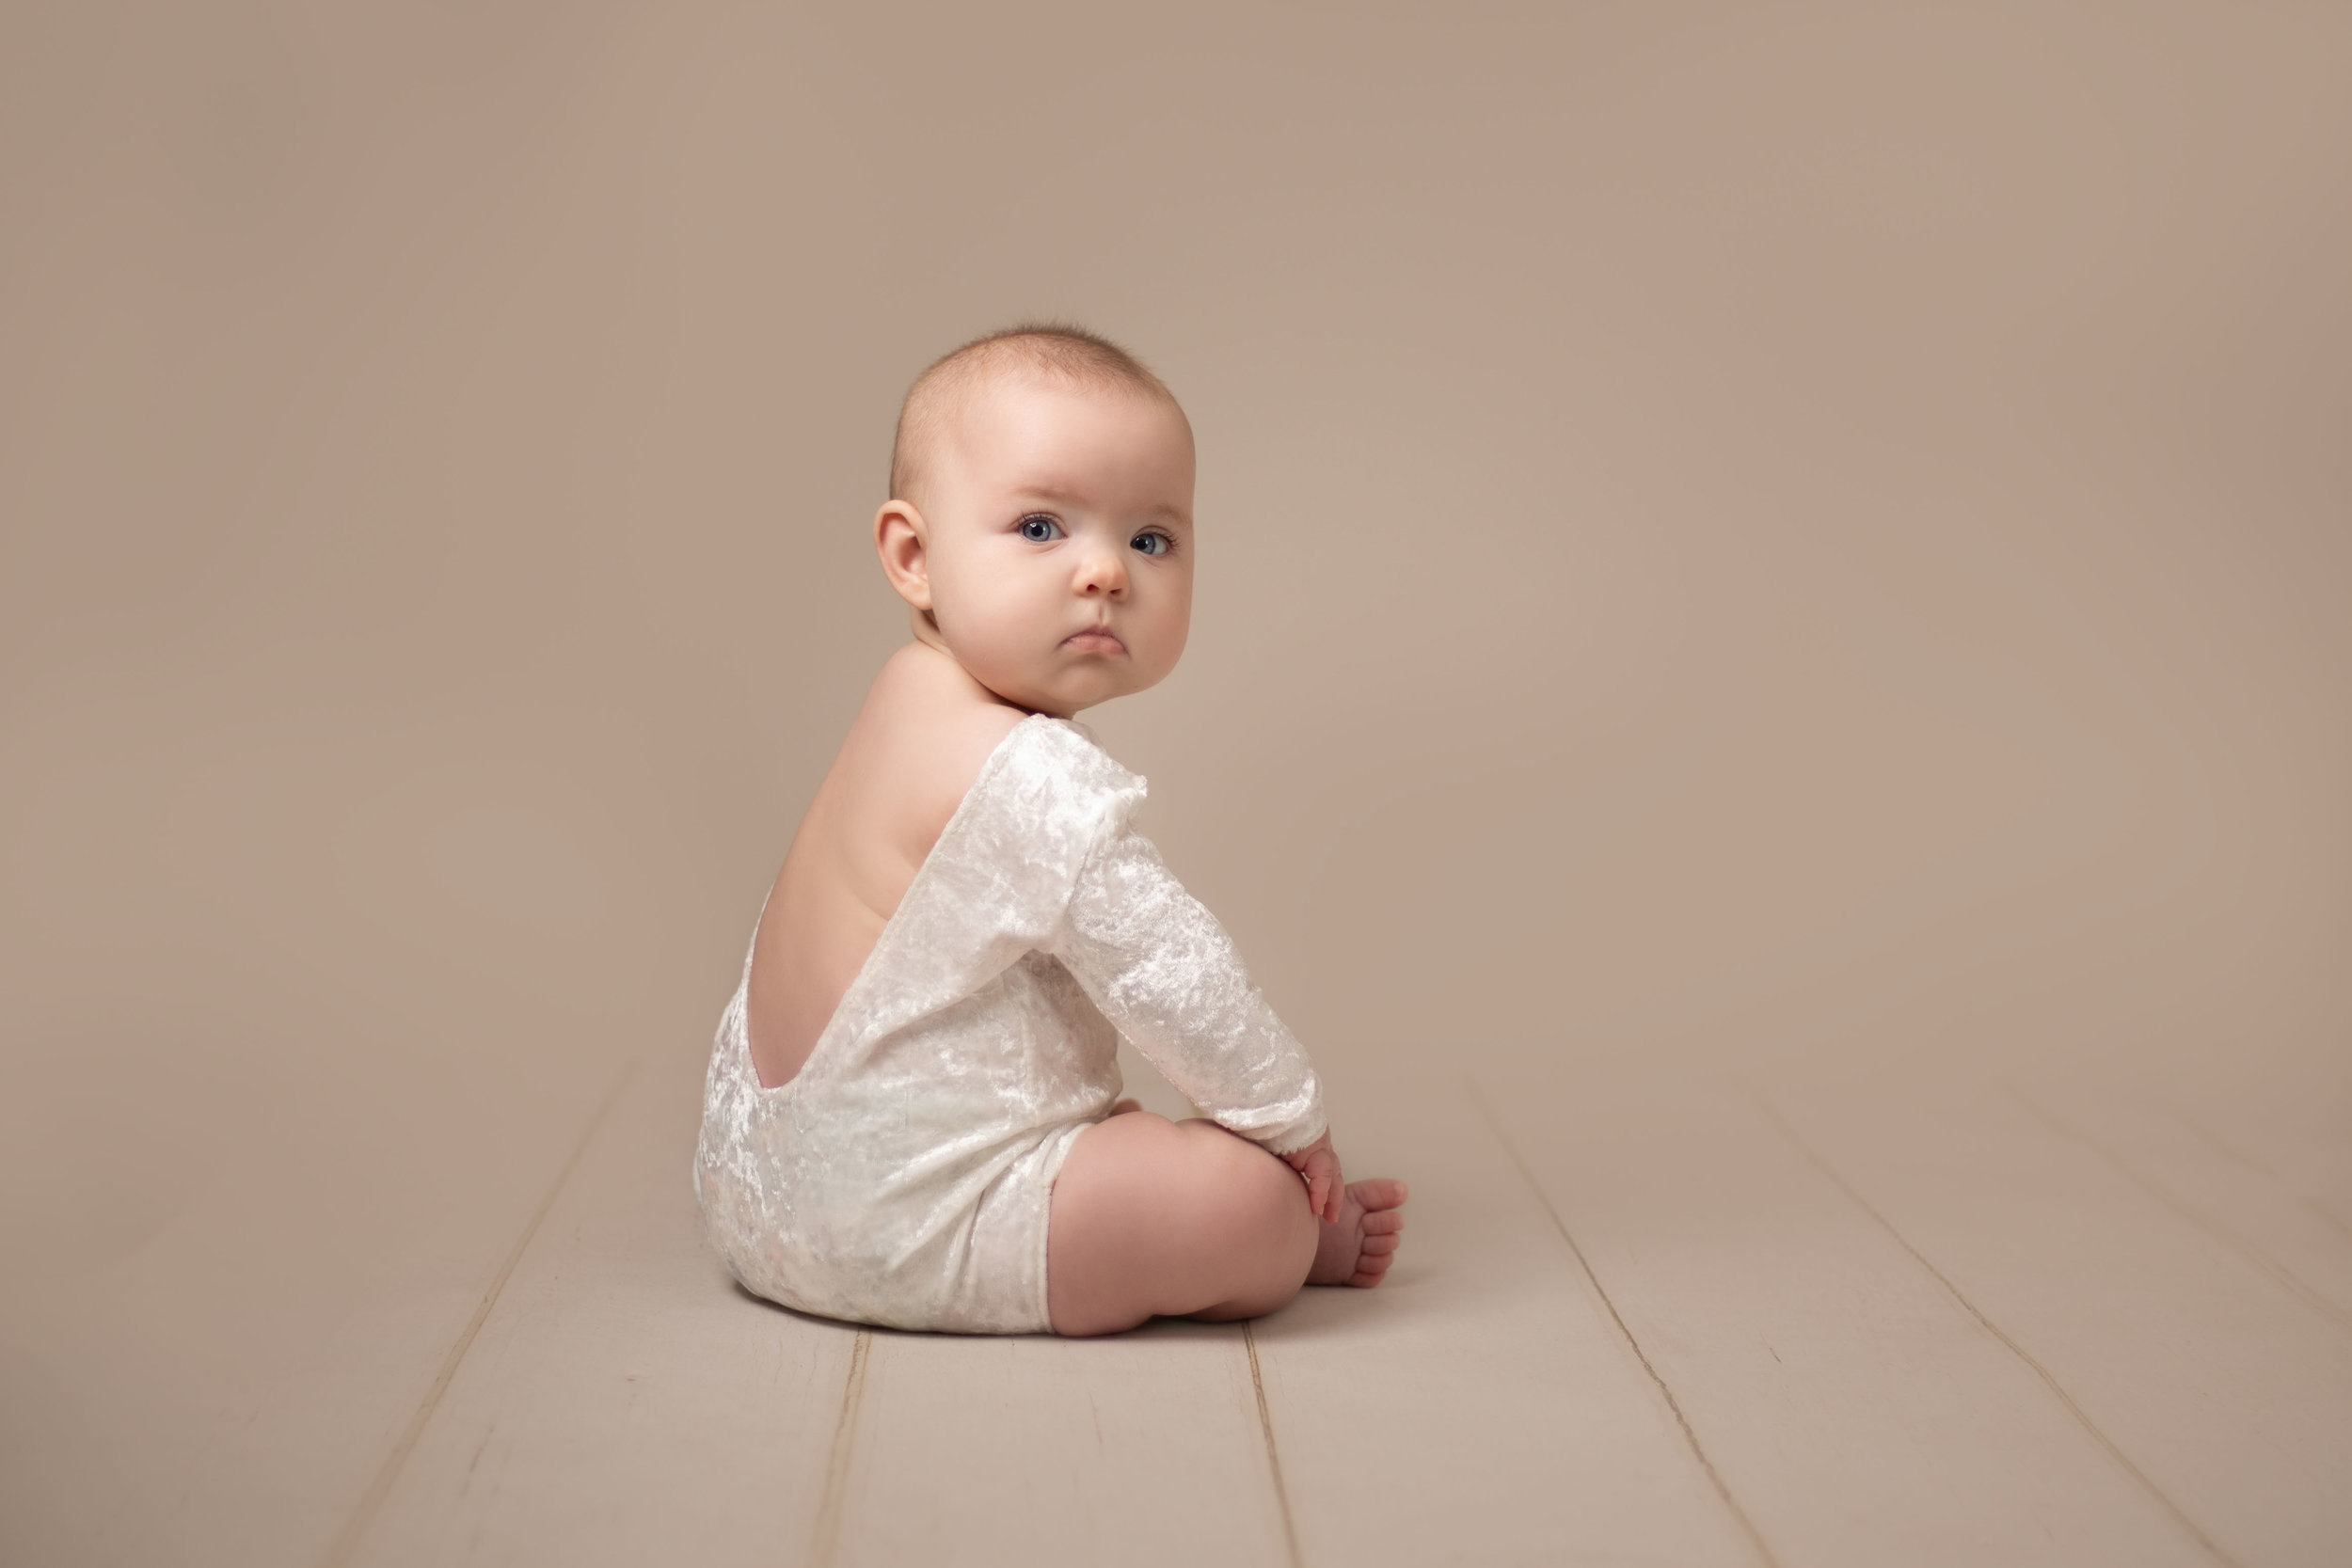 LEA-COOPER-PHOTOGRAPHY-CHILD-PHOTOGRAPHY-WILLENHALL-CHILDREN-PHOTOGRAPHER-WOLVERHAMPTON-BILSTON-WEDNESBURY-KIDS-PHOTOGRAPHER-SITTER-SESSION-MILESTONE--7.JPG